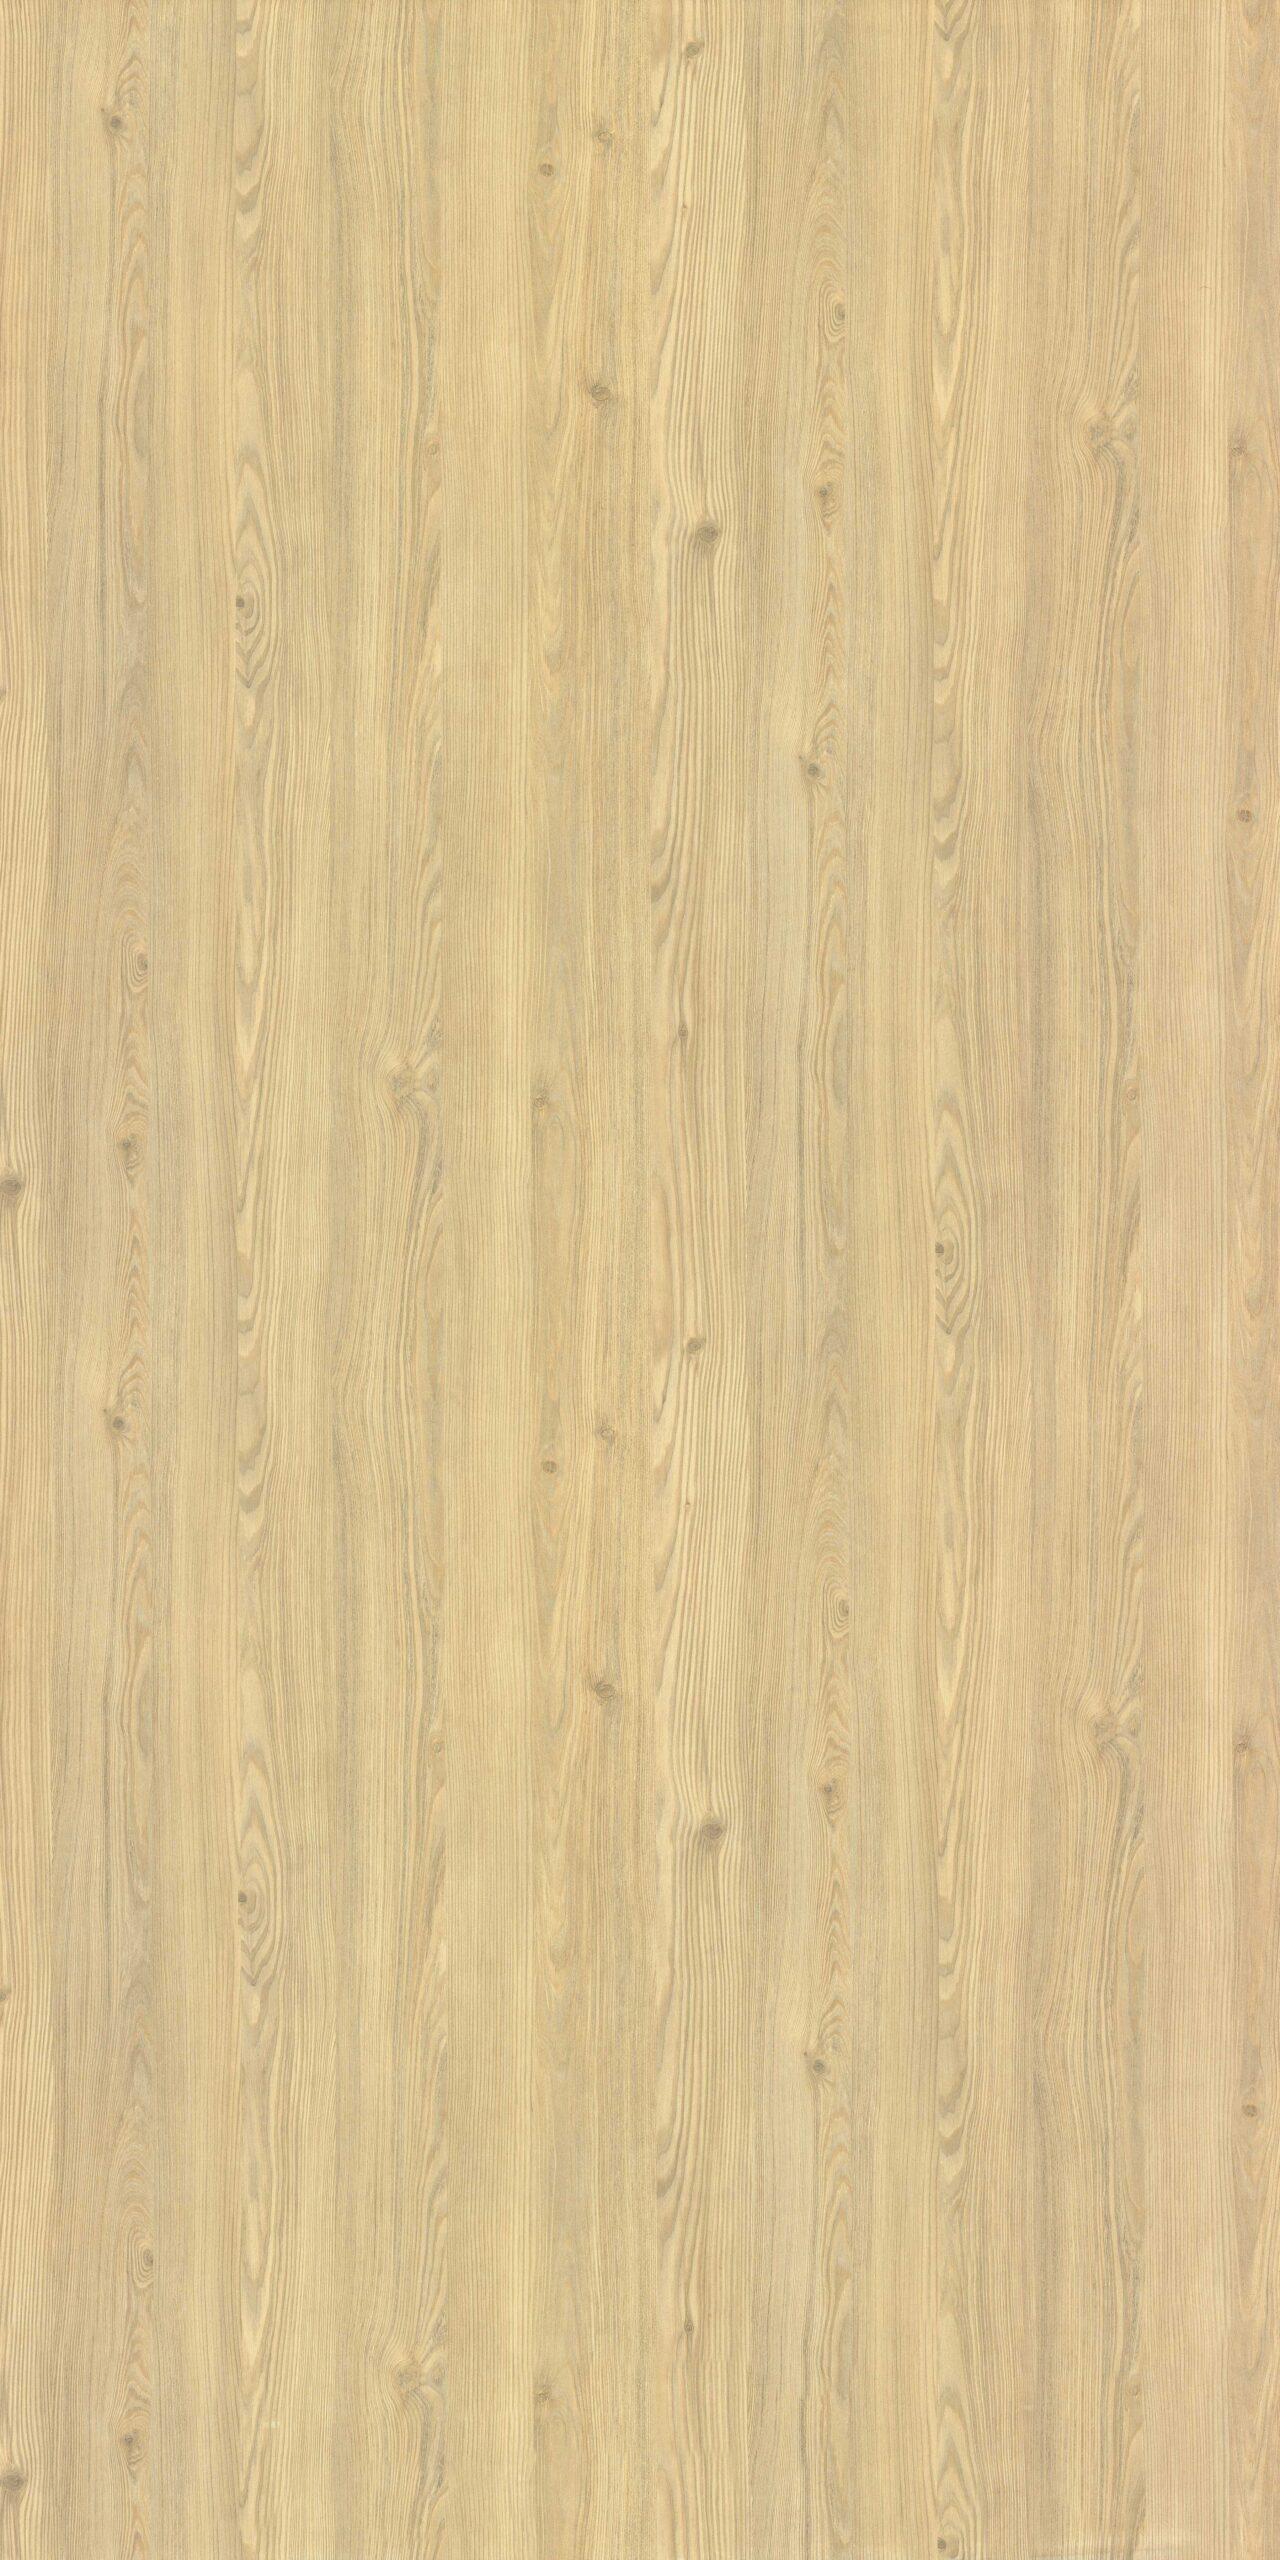 Laminates Sheet Suppliers In Ahmedabad Wood 4106